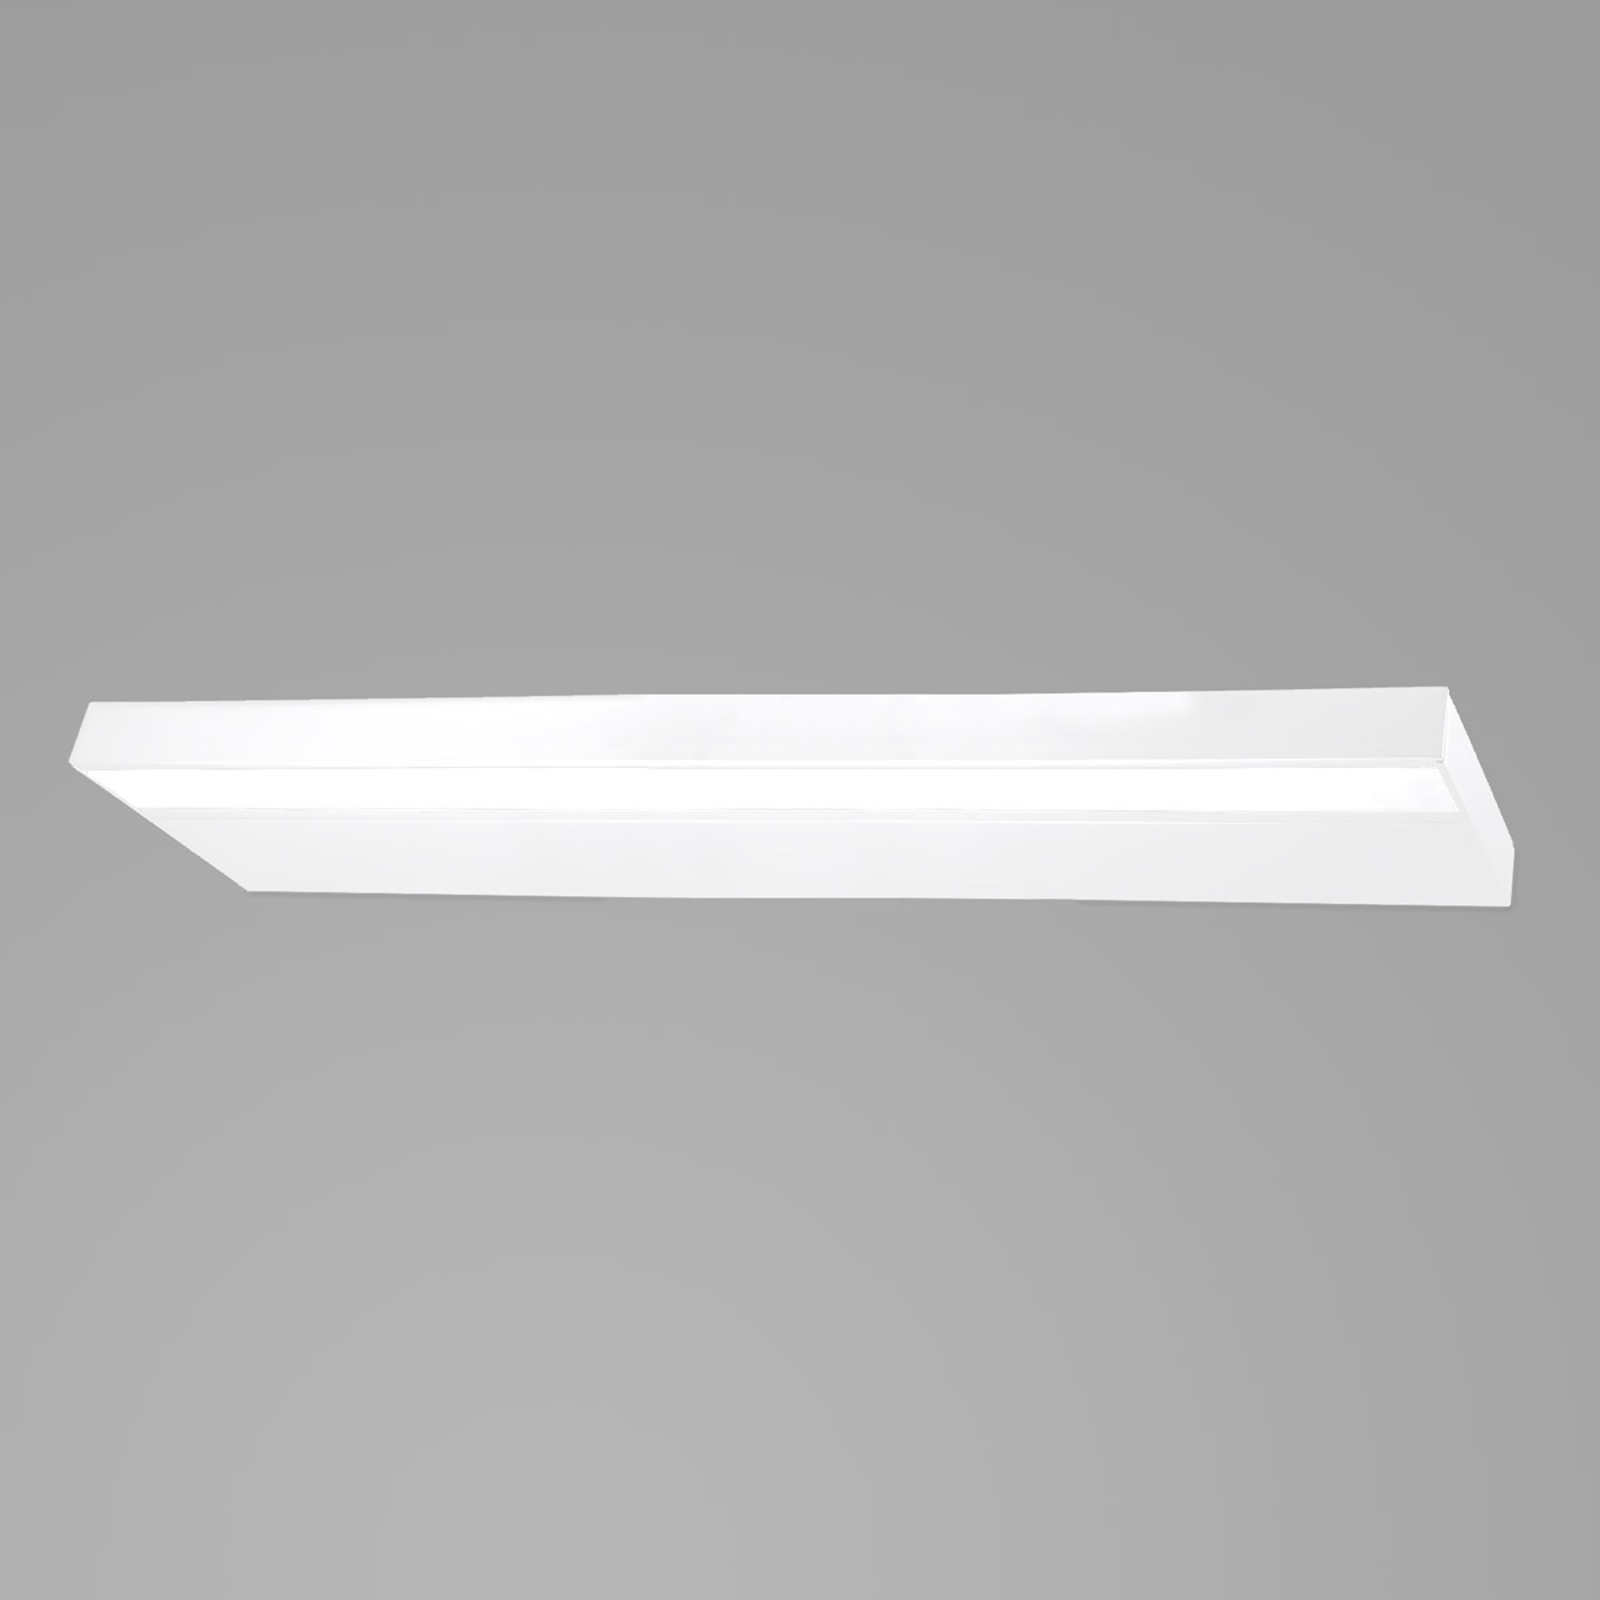 Applique salle de bain LED Prim IP20 120cm, blanc